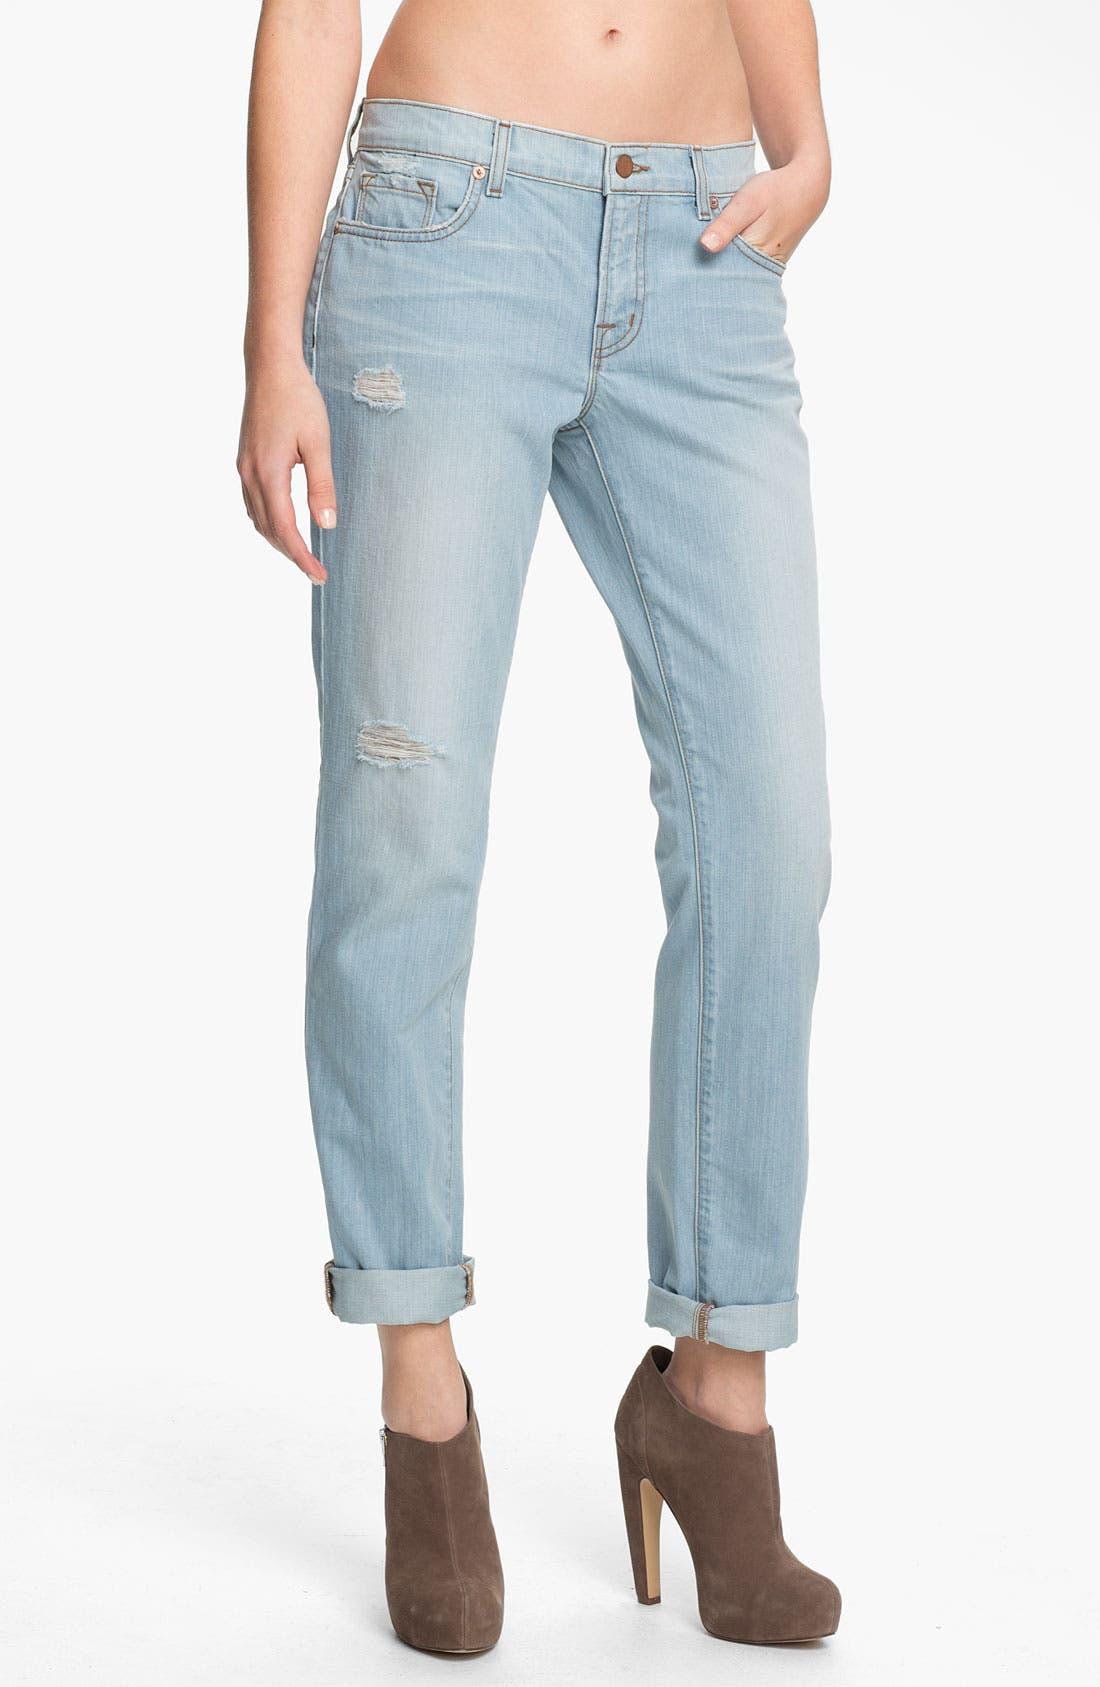 Alternate Image 1 Selected - J Brand 'Aidan' Distressed Boyfriend Fit Jeans (Illusion Destruct)